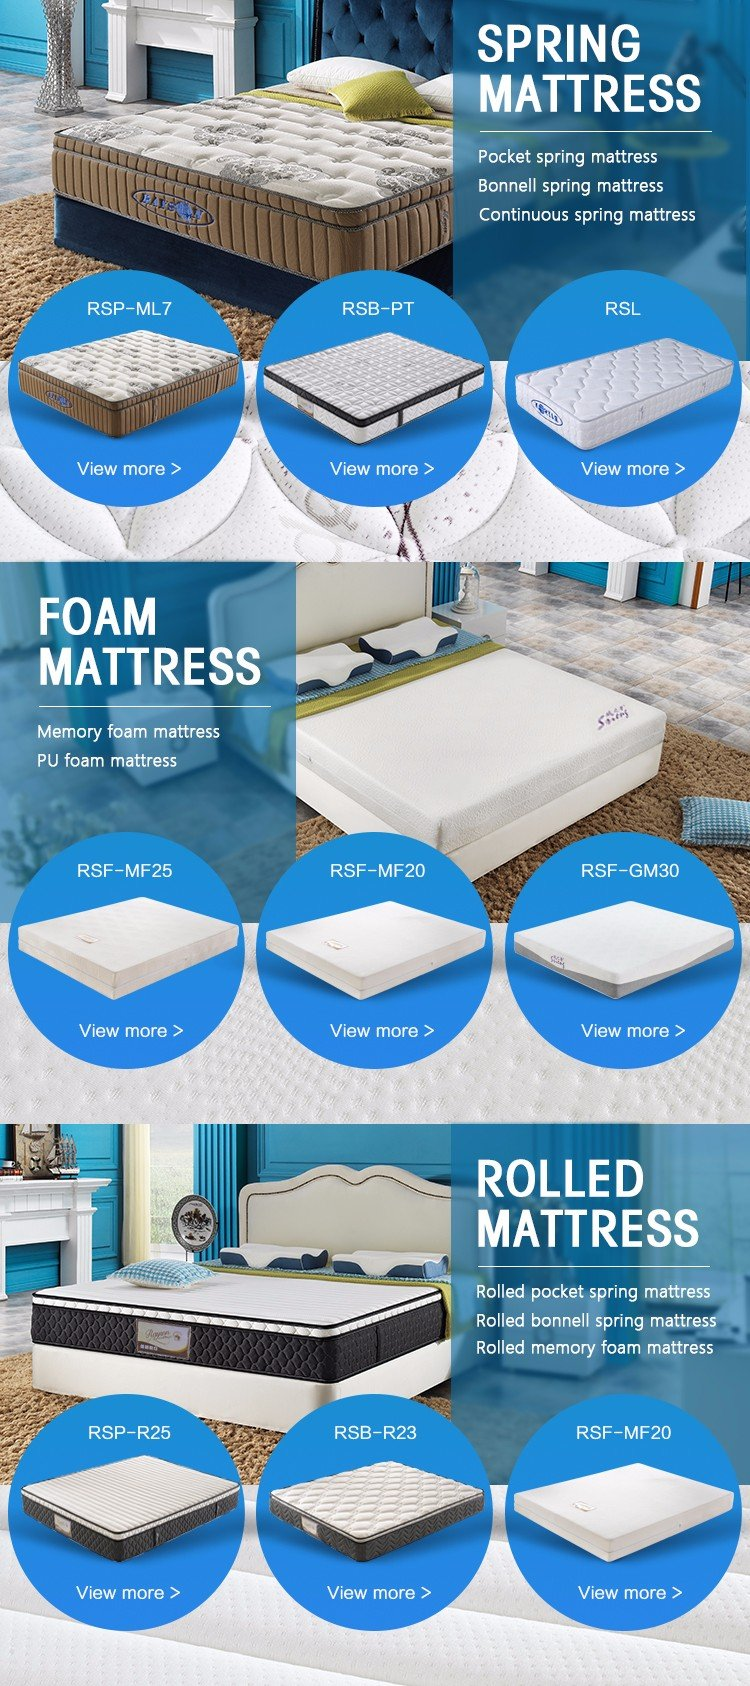 Rayson Mattress New Rolled bonnell spring mattress Supply-10